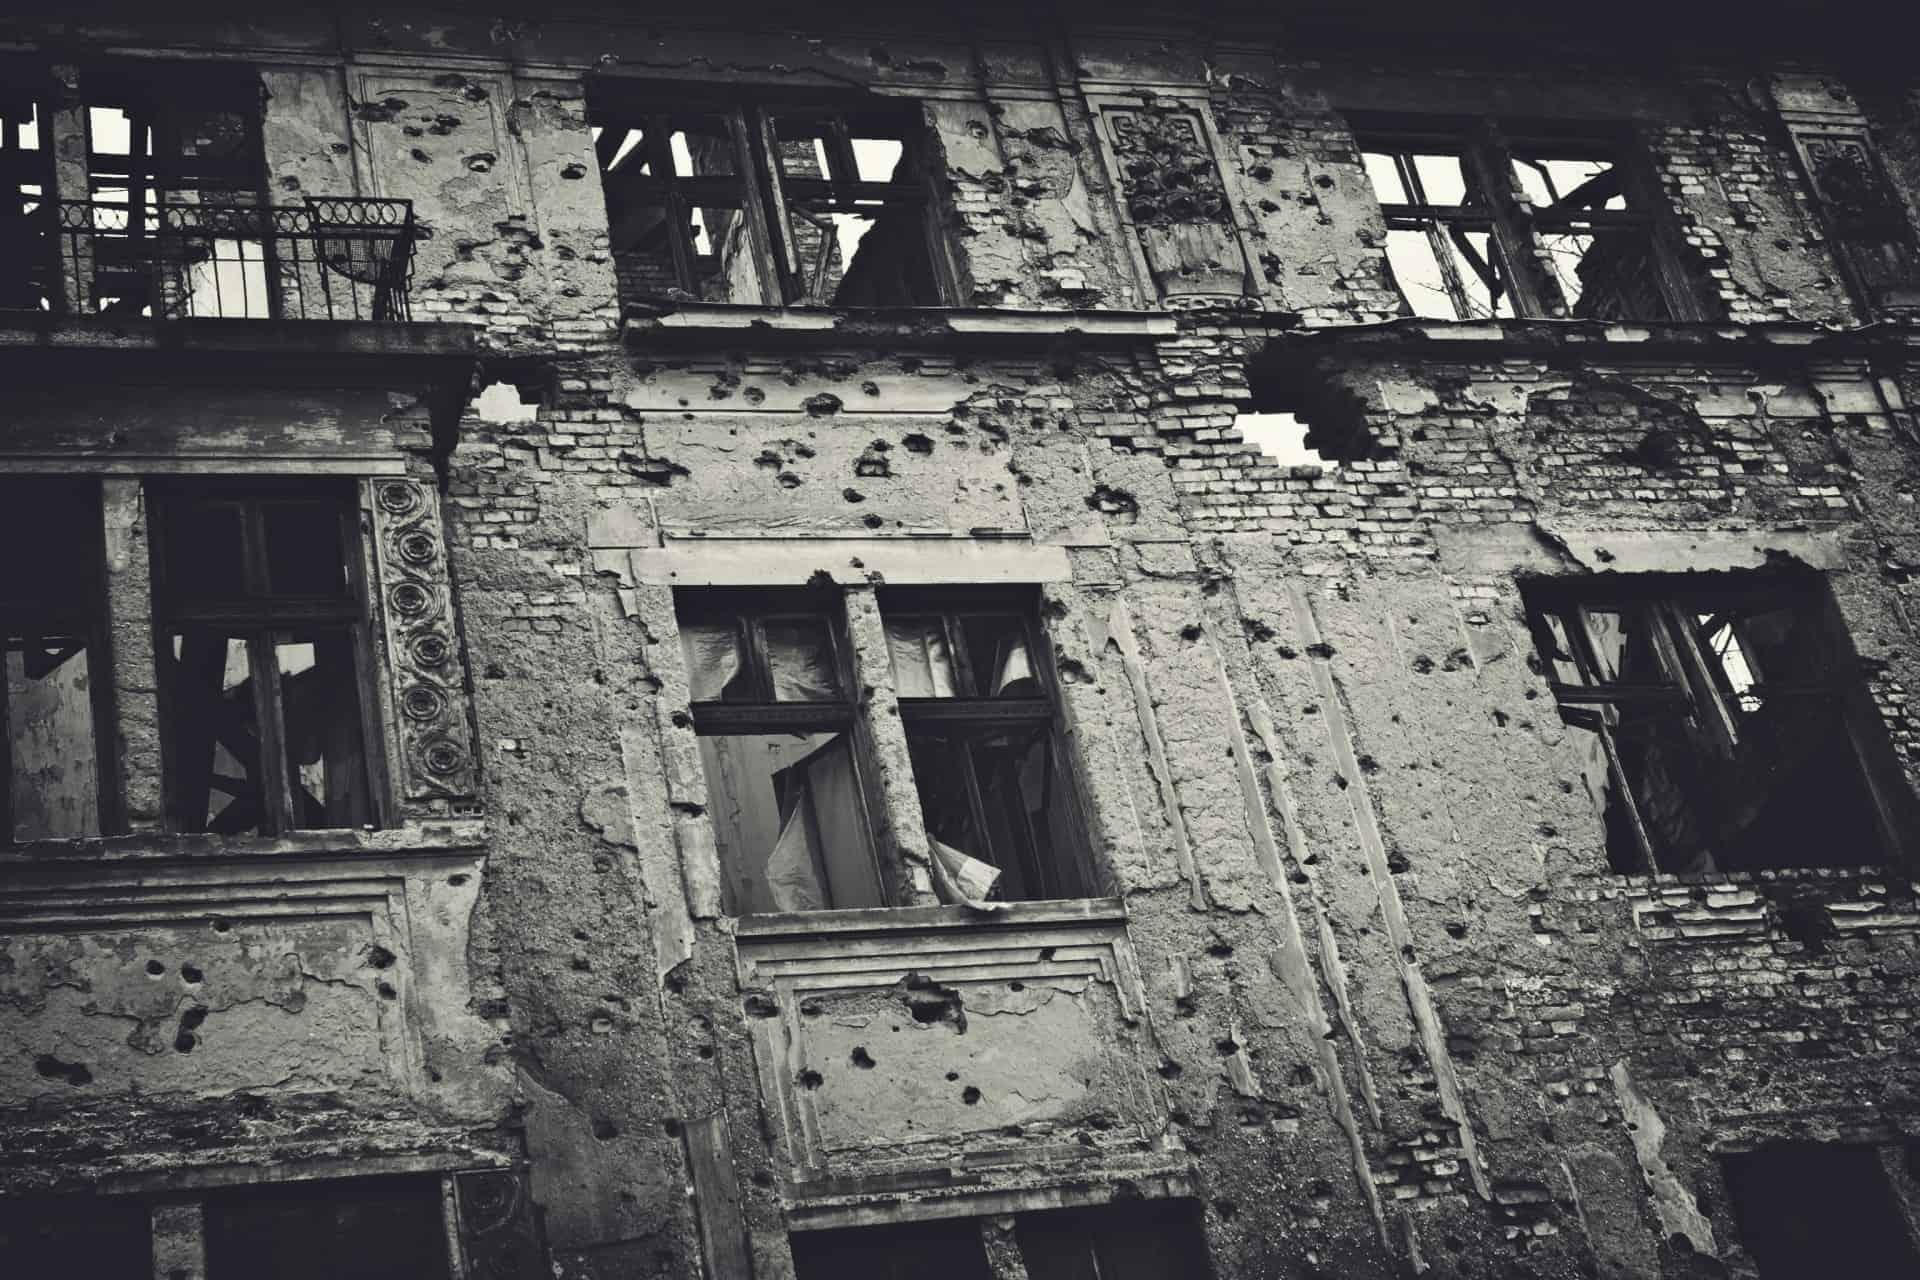 Damage from the Balkans War